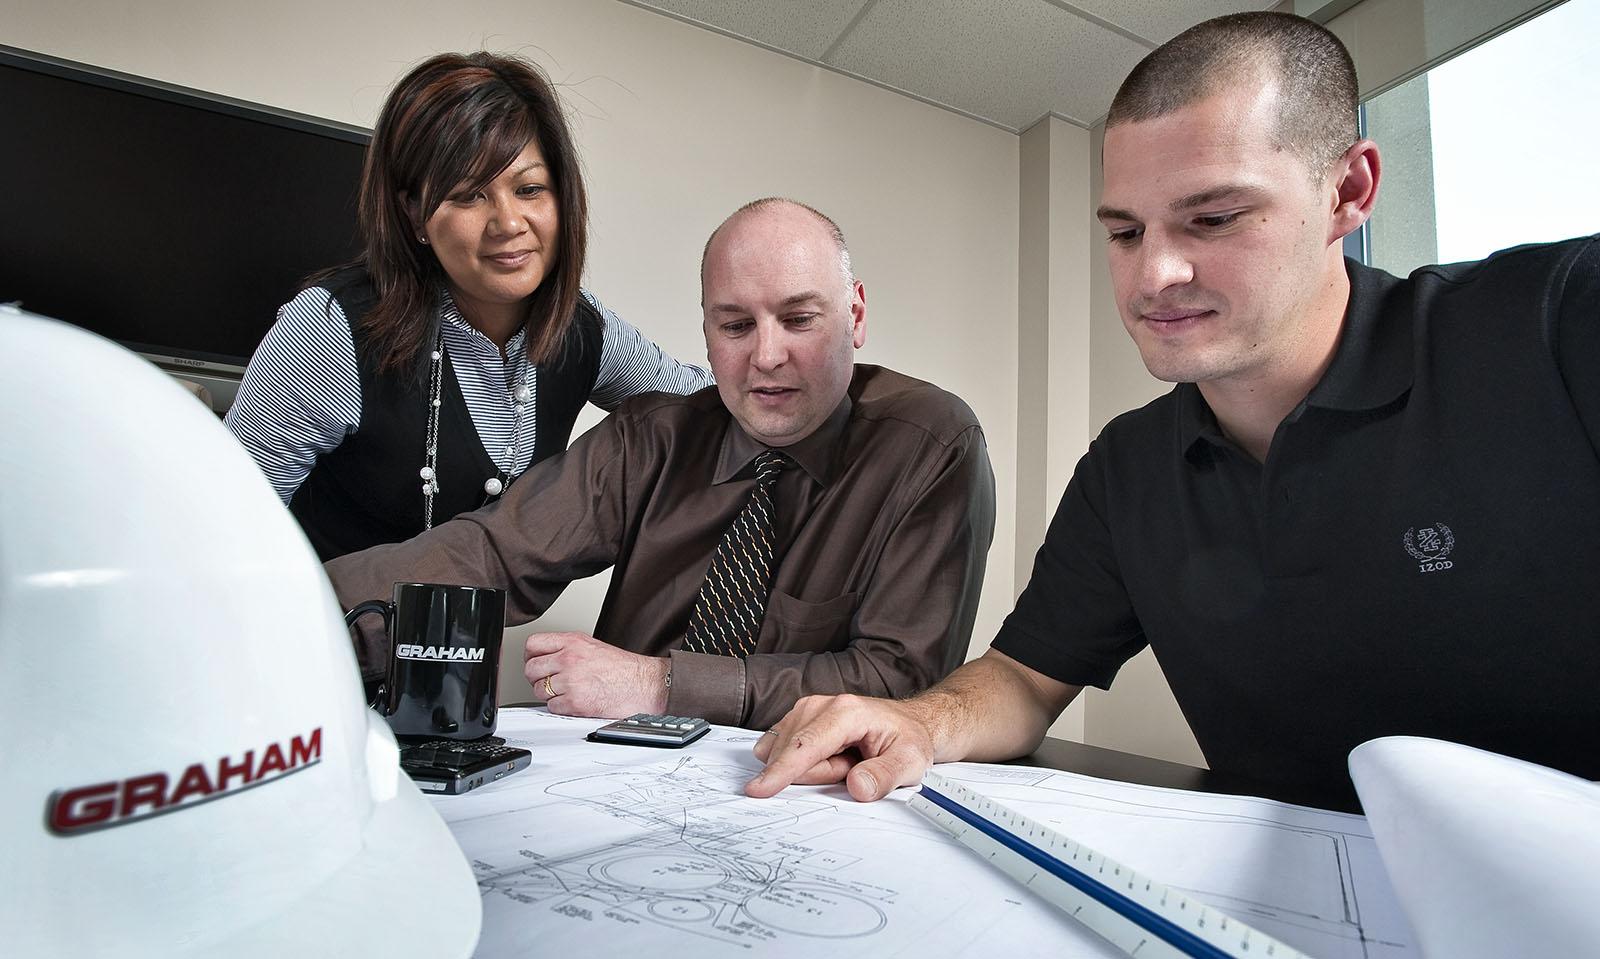 Three individuals viewing blueprints.